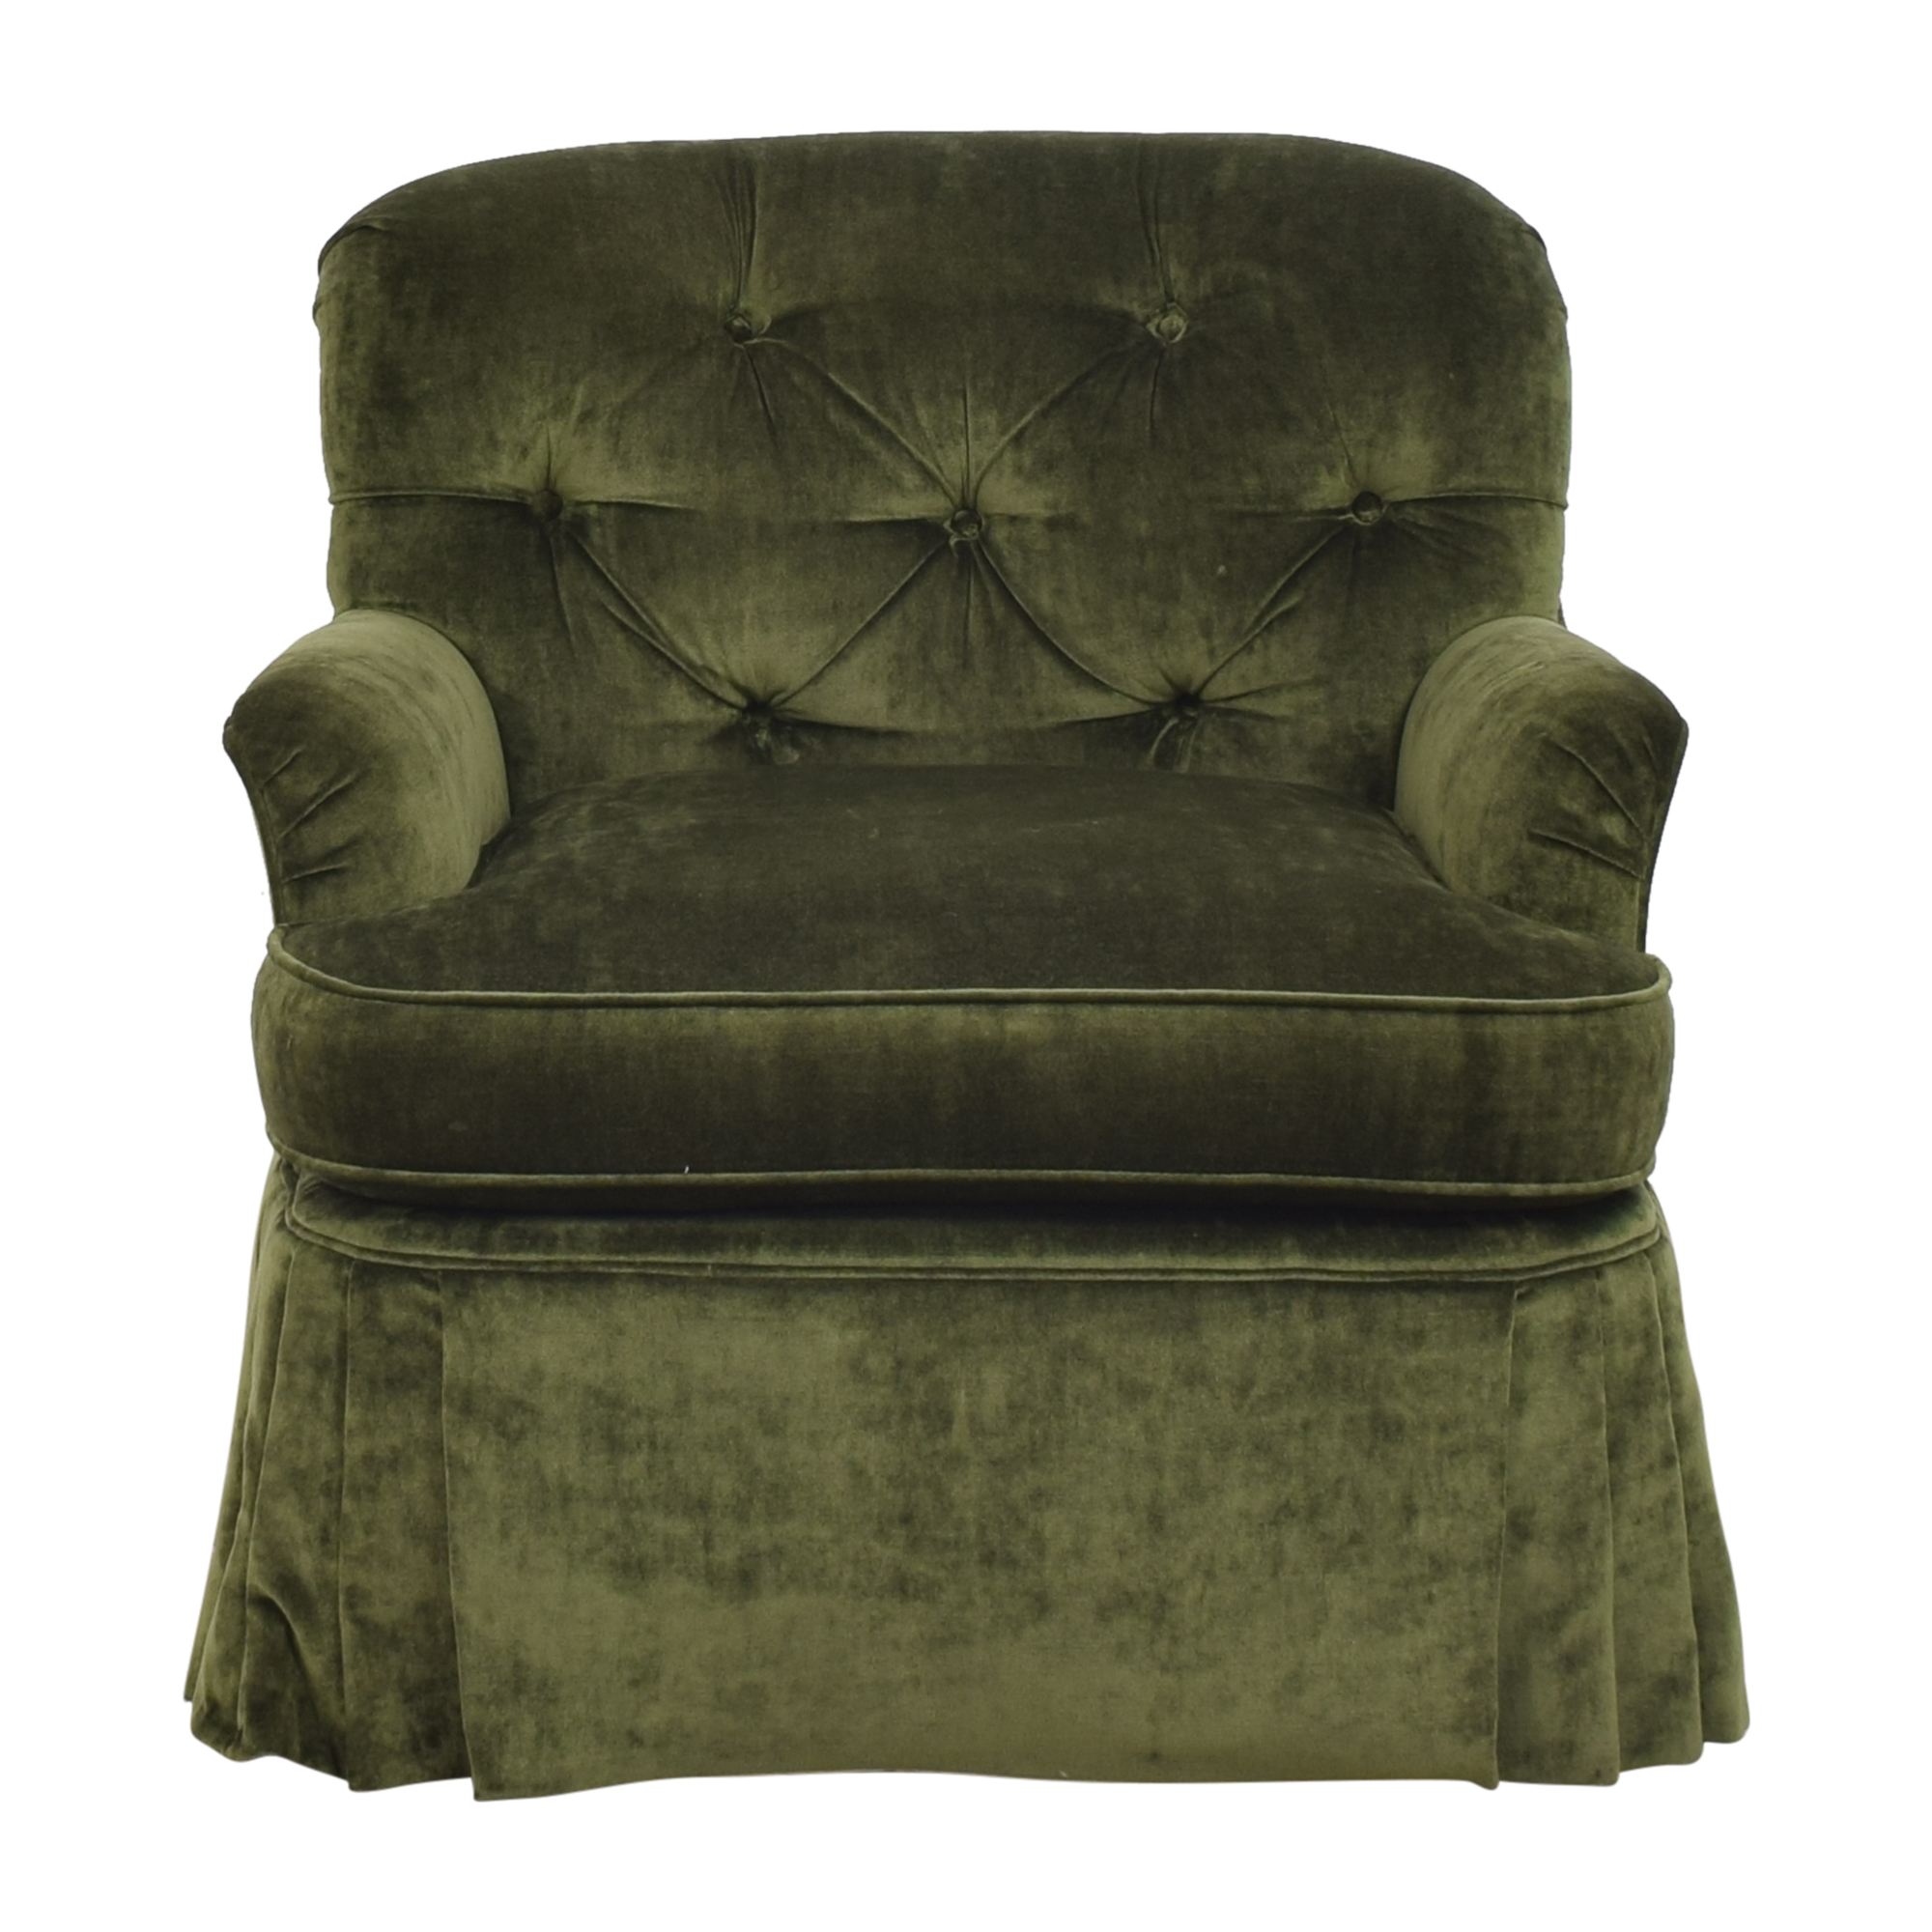 Calico Calico Corners Brandy Wine Design Accent Chair Green